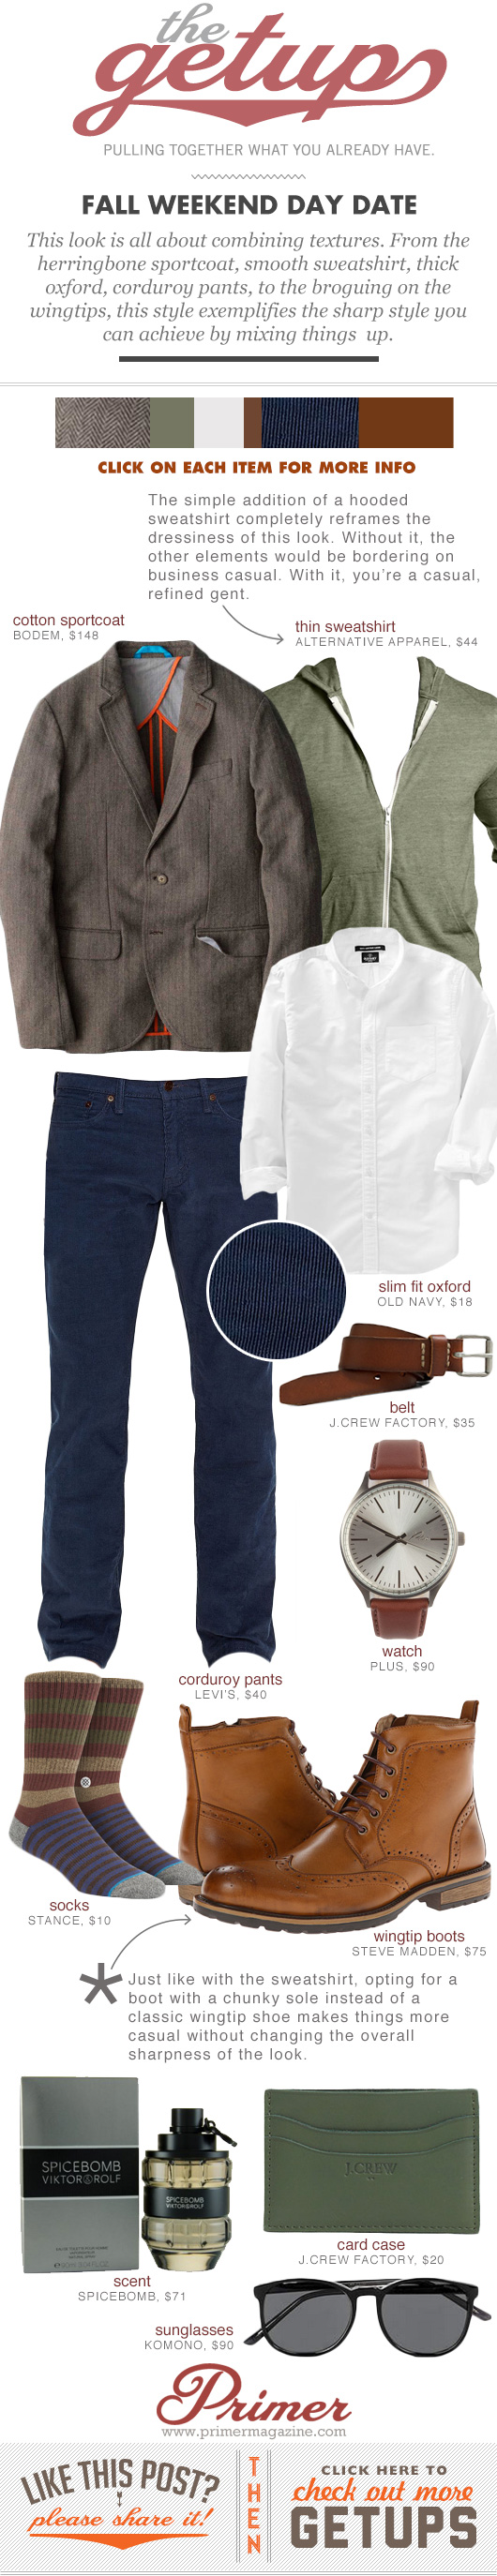 Getup - Fall Weekend Day Date, Blazer, button up shirt, blue corduroy pants